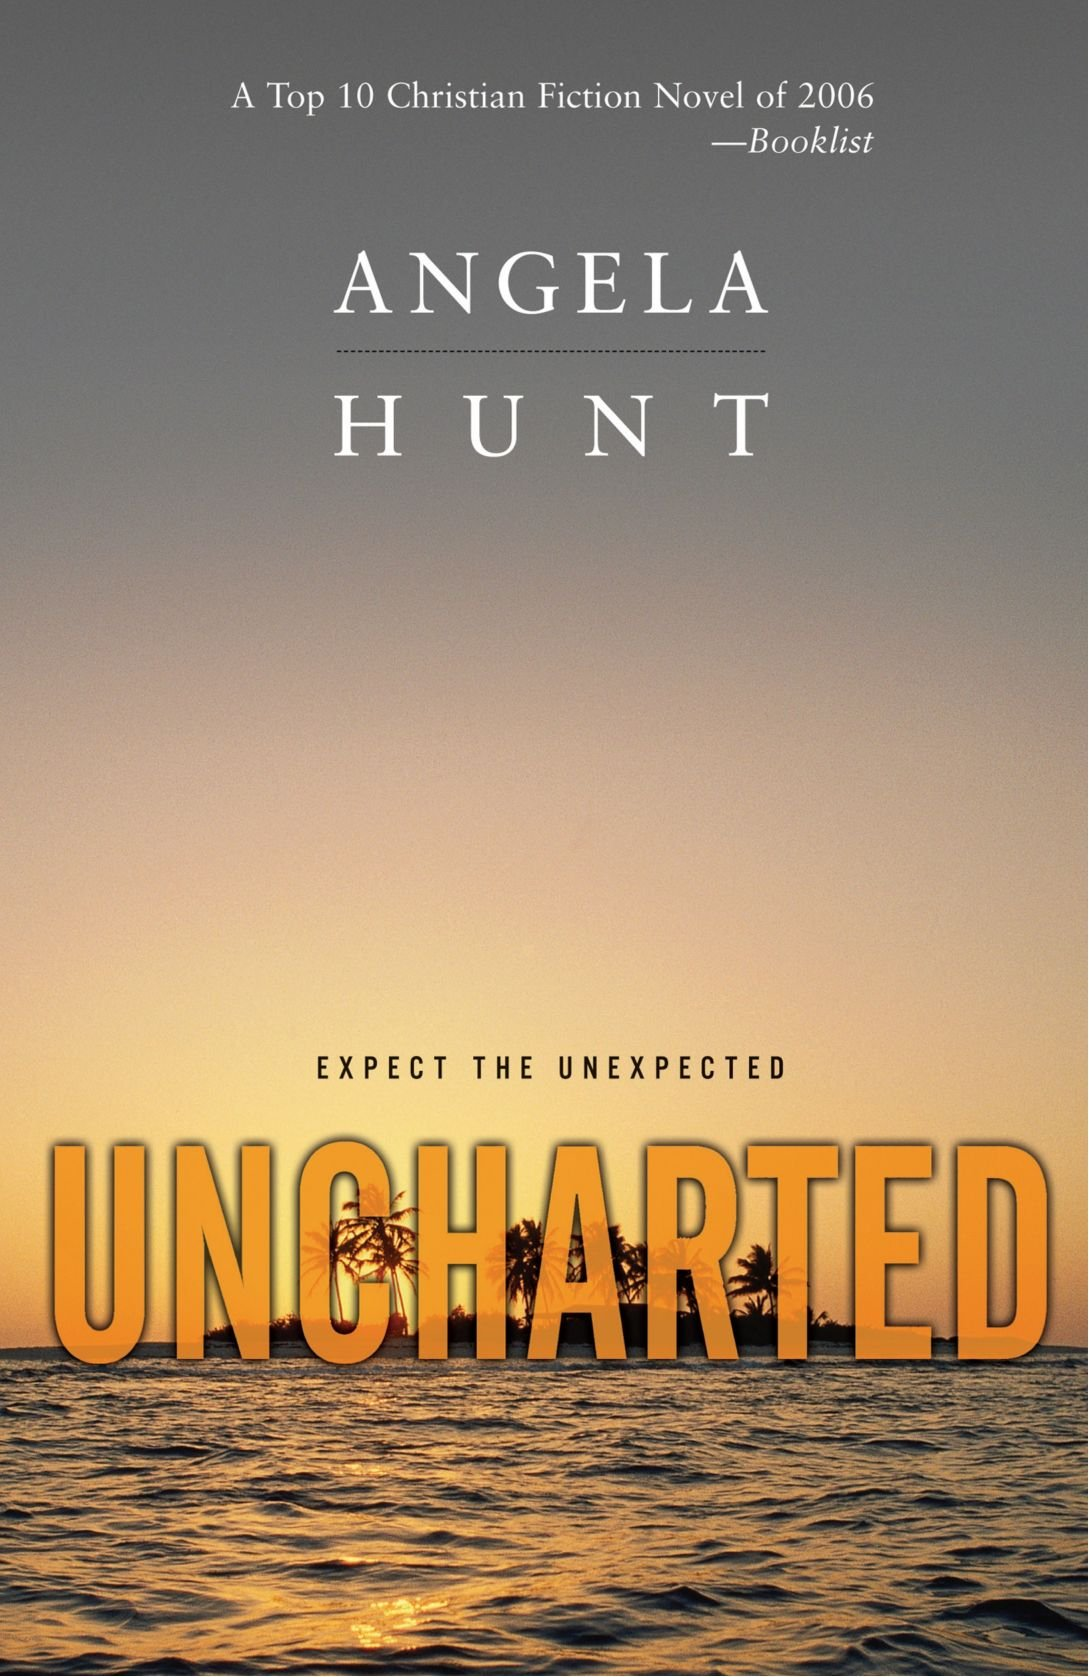 Image result for uncharted angela hunt